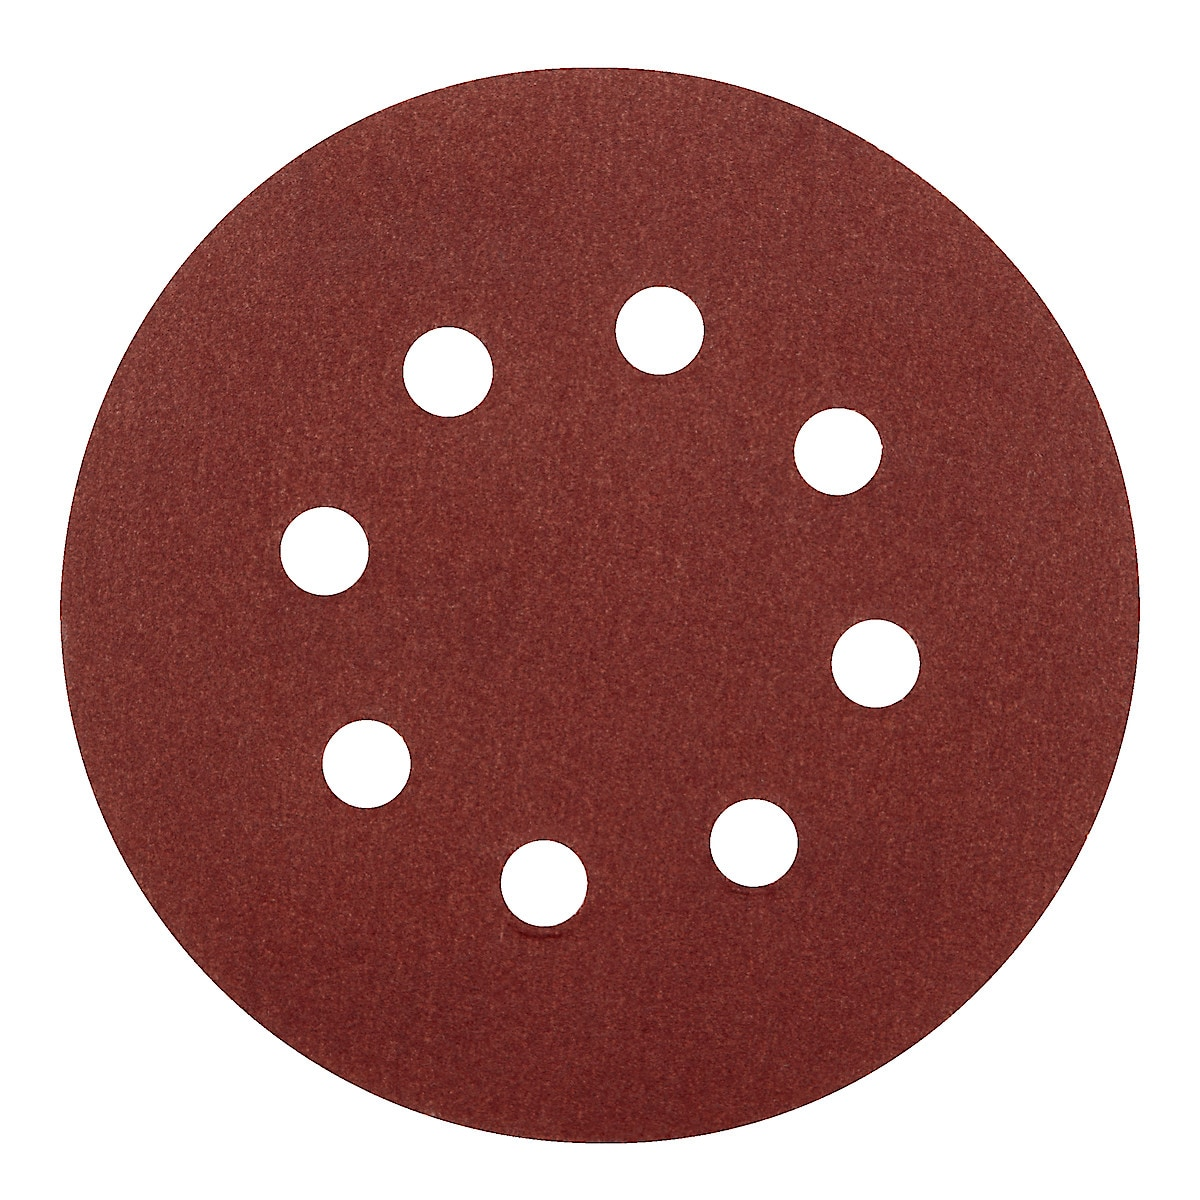 Hiomapaperi pyöreä 125 mm, Cocraft